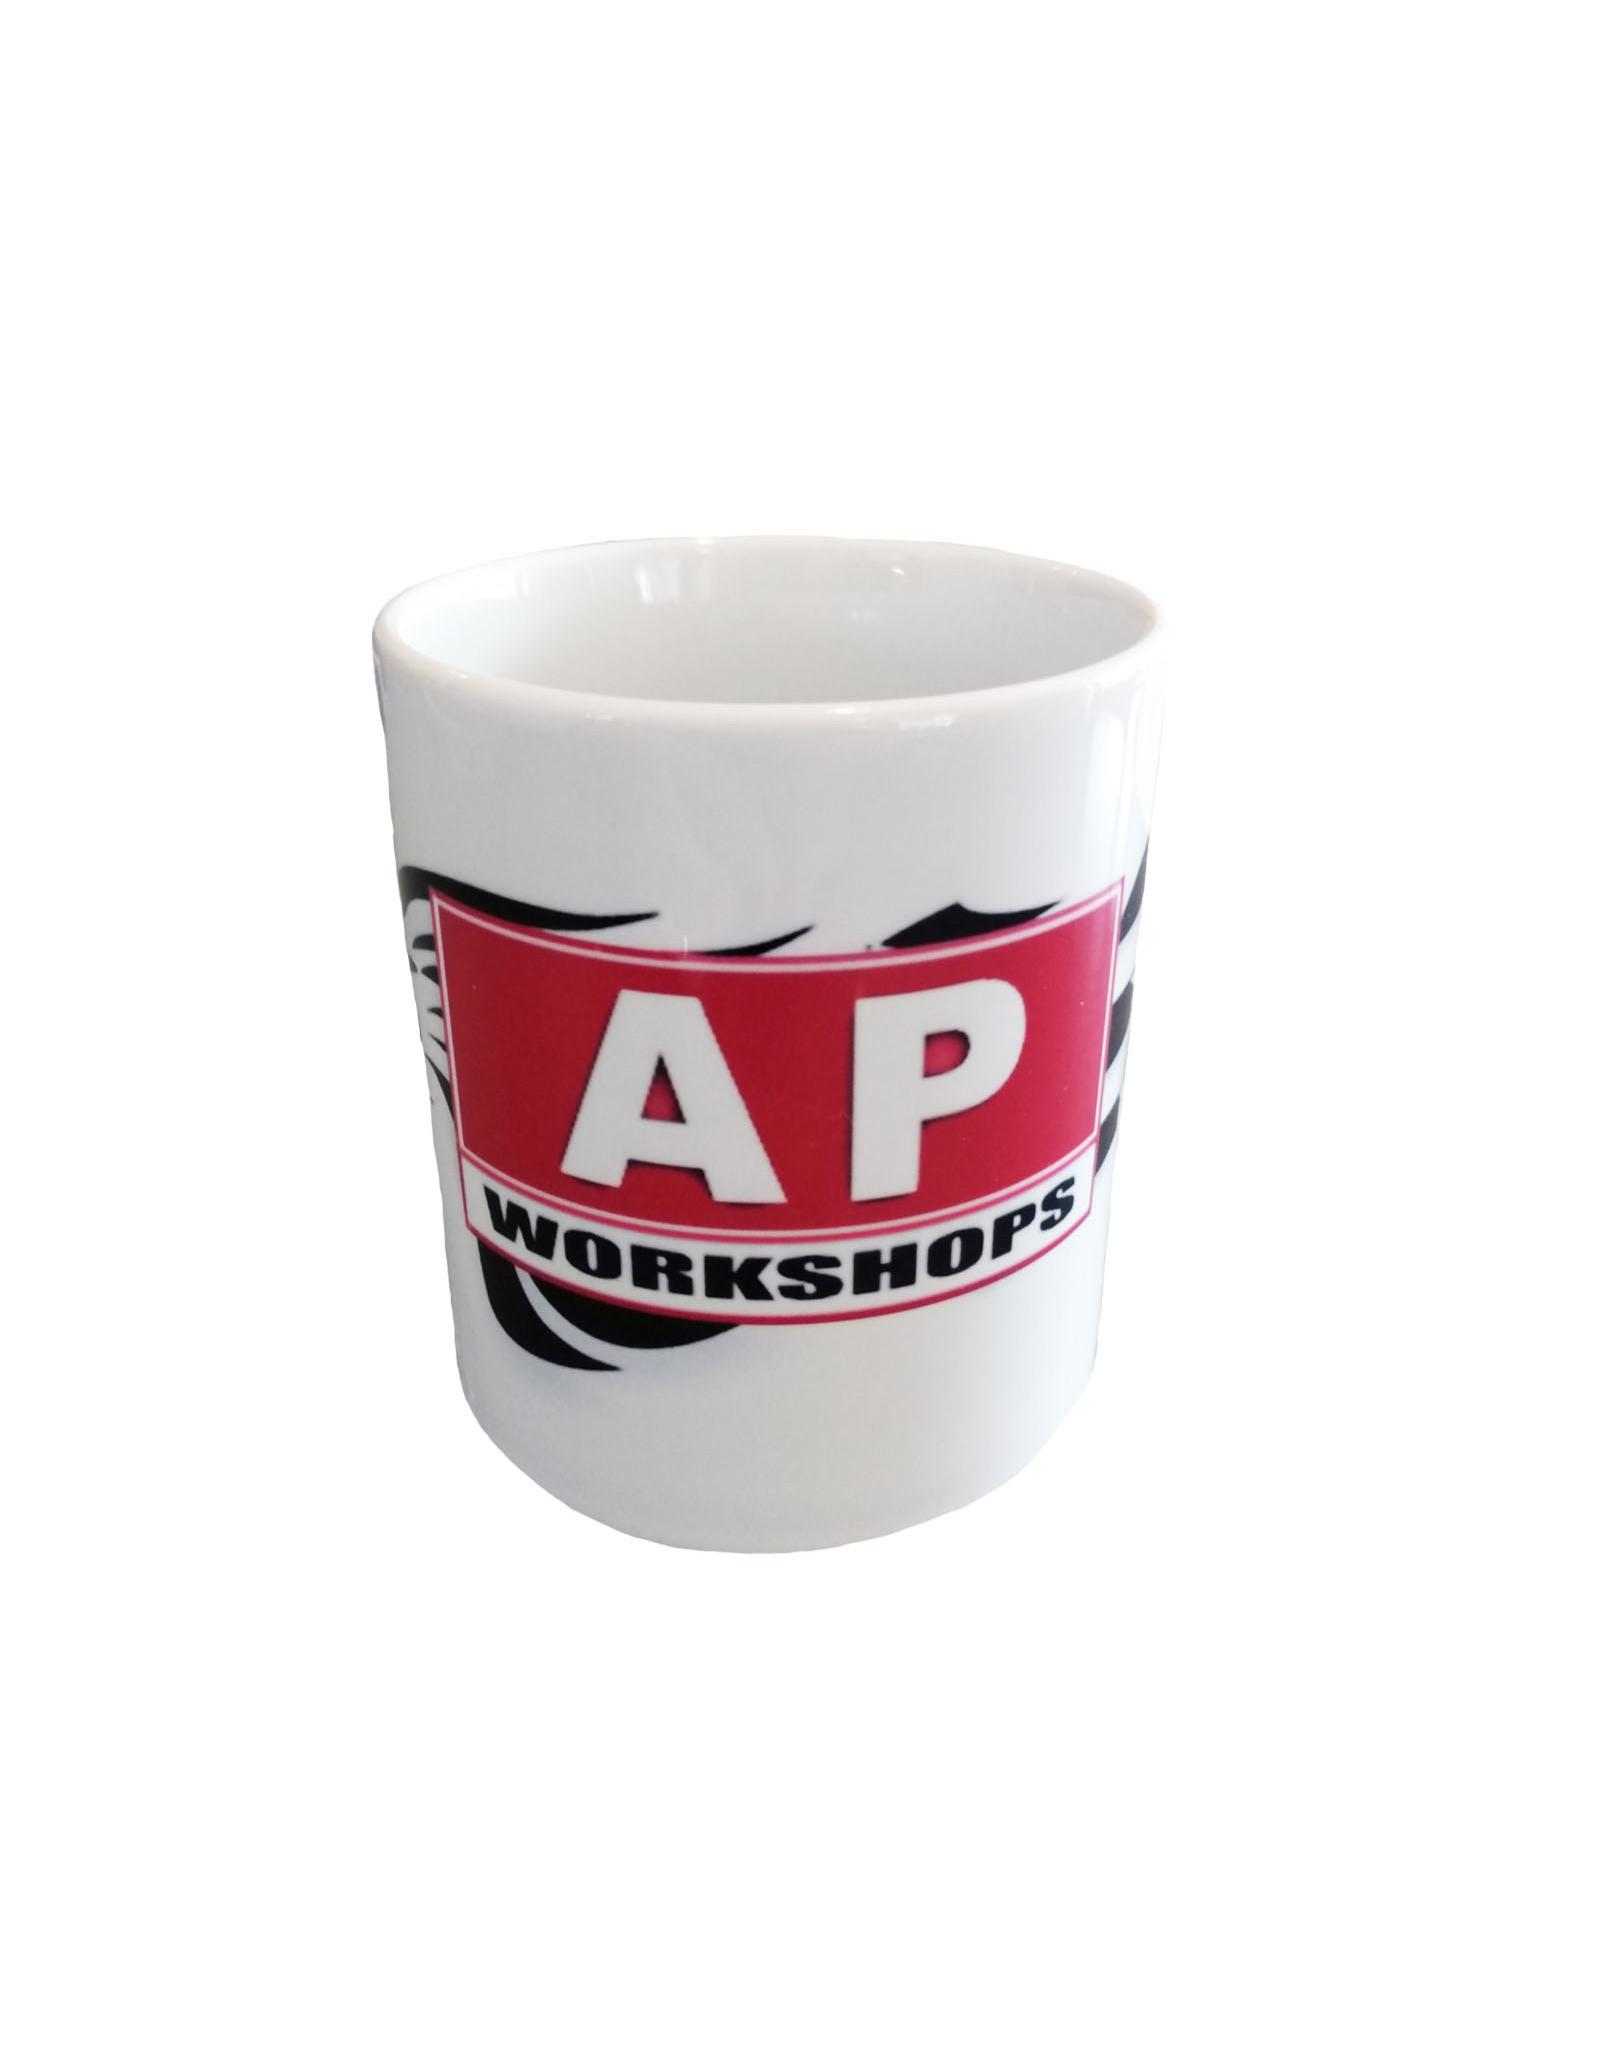 AP workshops AP workshop mug